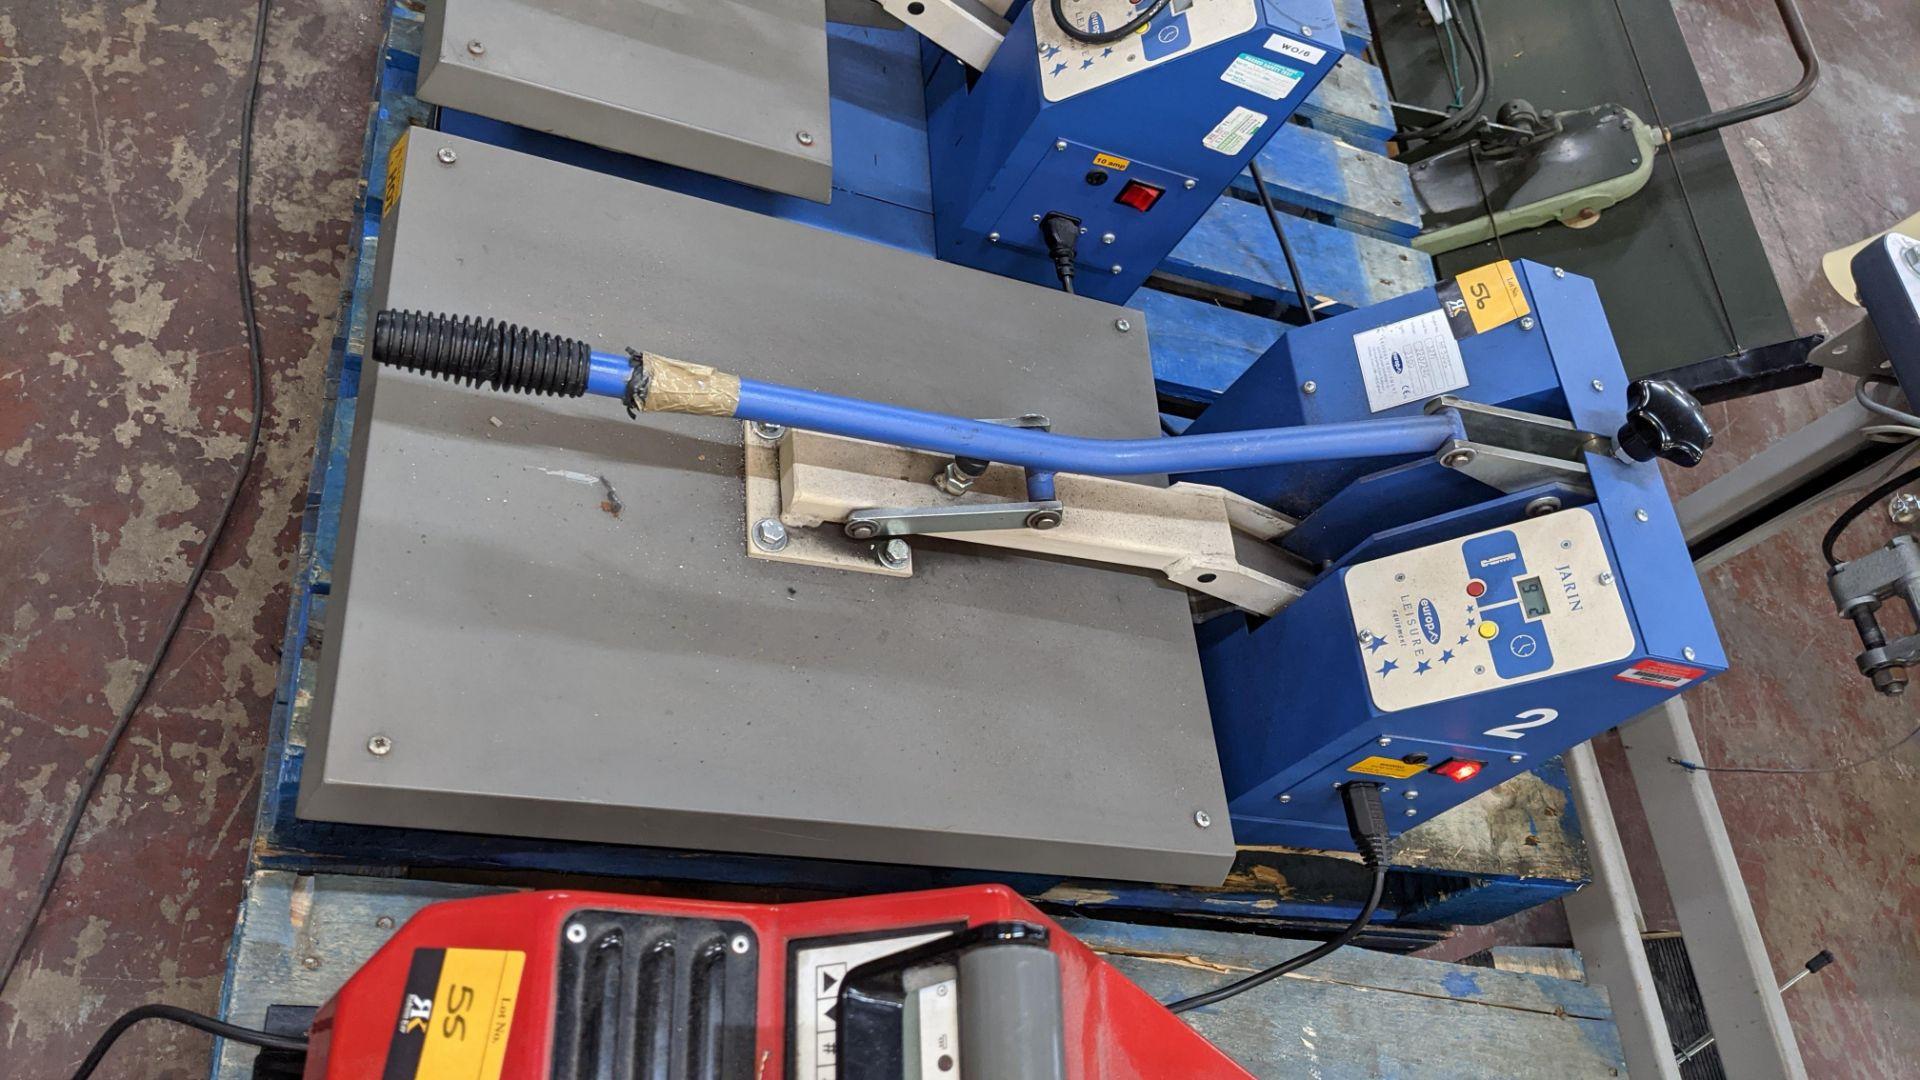 Europa Jarin benchtop heat transfer press model HF5000 - Image 3 of 13